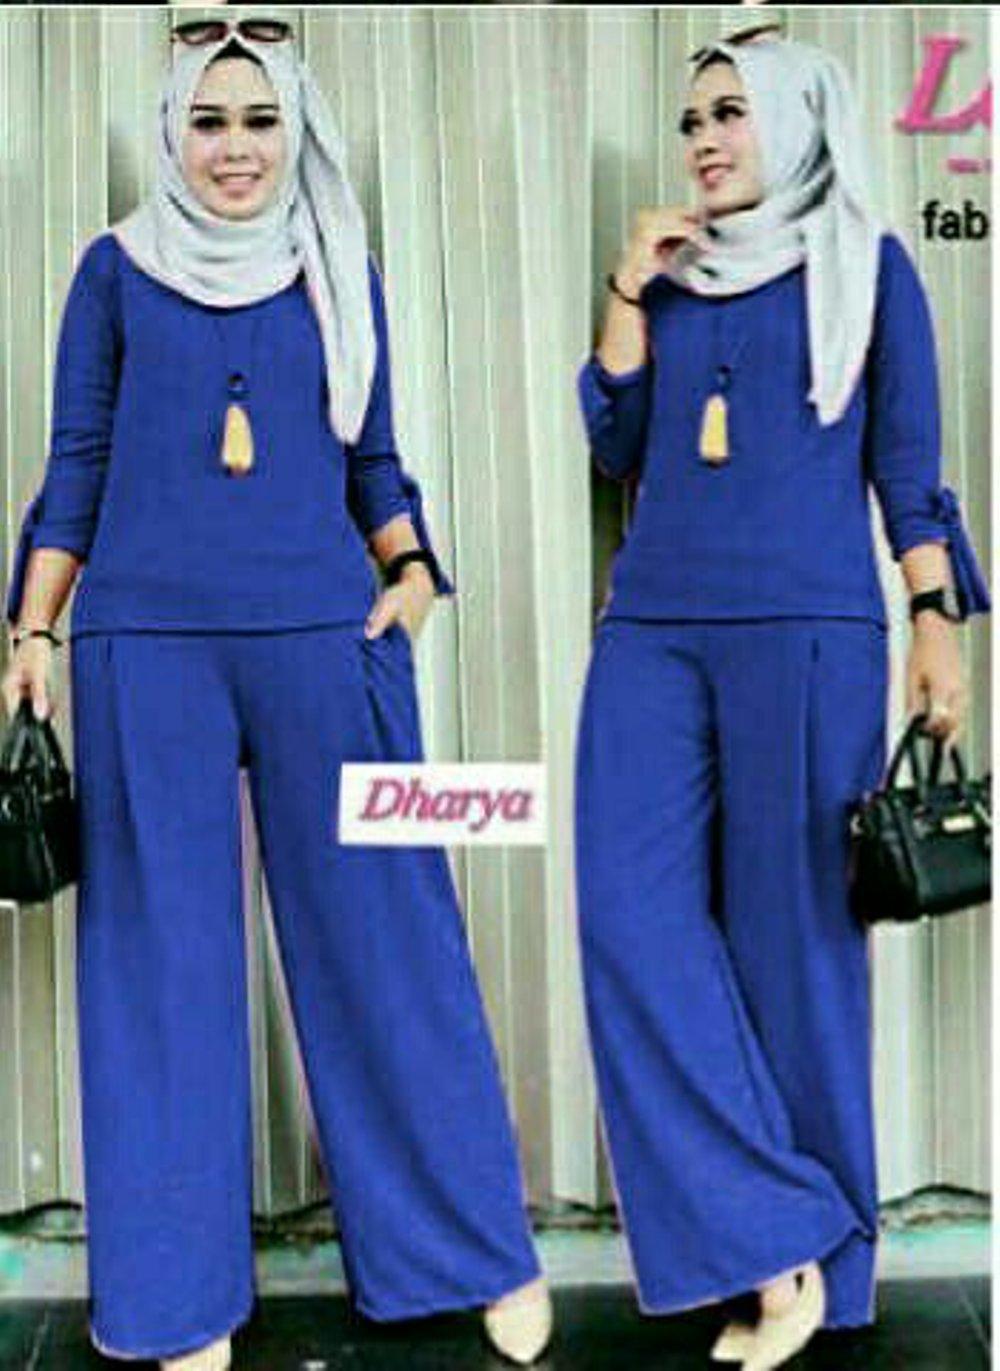 Fashion Online Daftar Harga Desember 2018 Dksh New Arrival Sendal Tali Trendy Wanita Dknz 378 Set Levita Benhur Setelan Baju Muslim Polos Pf